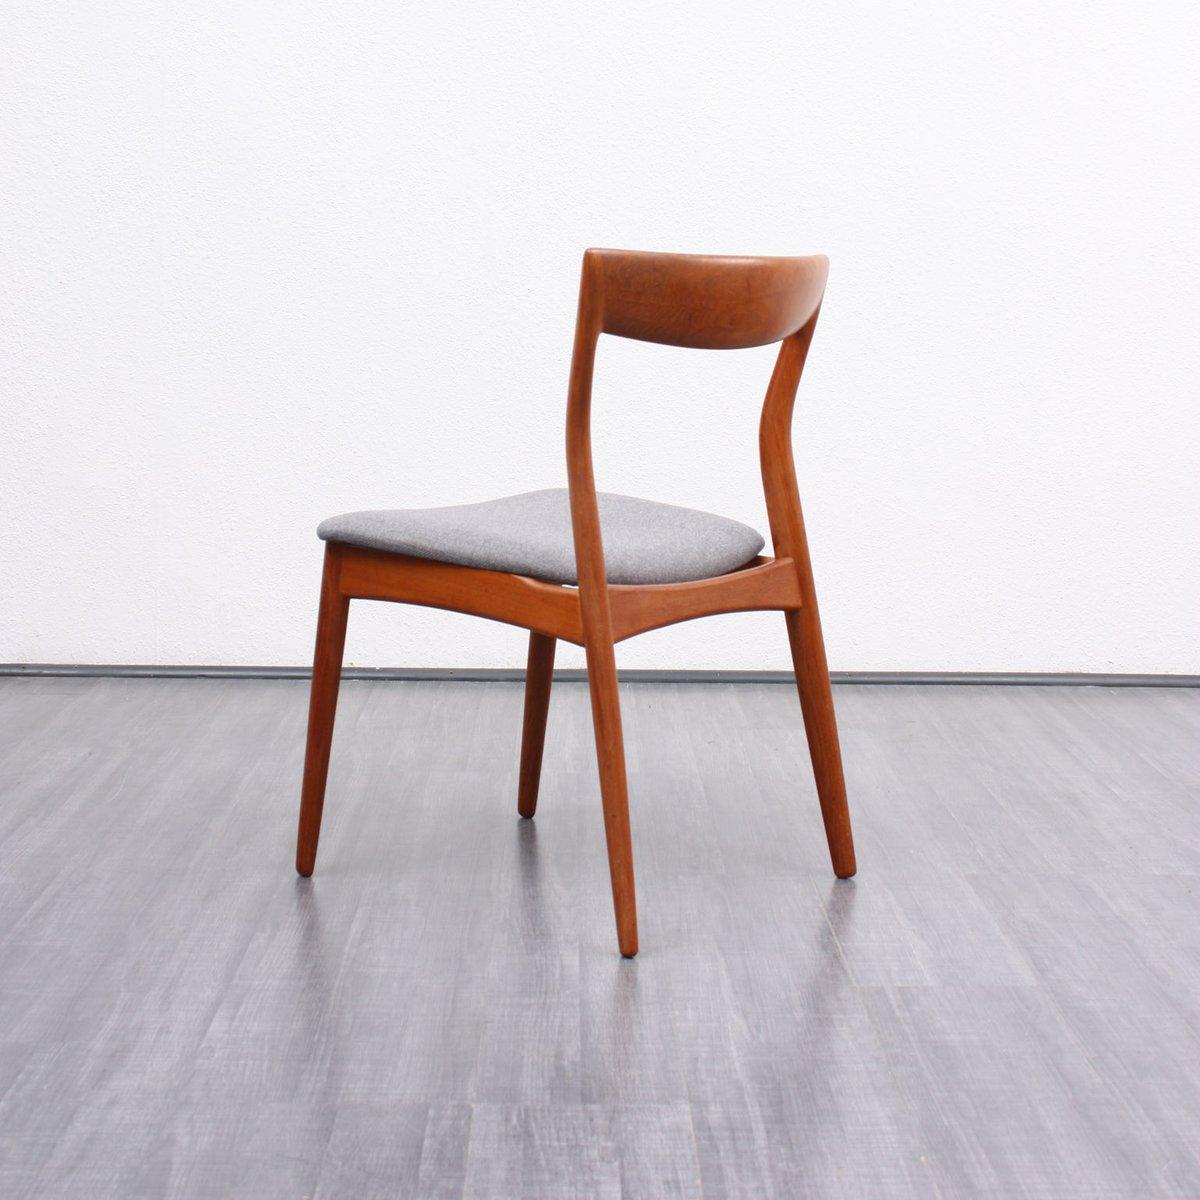 vintage danish teak dining chairs set of 4 for sale at pamono. Black Bedroom Furniture Sets. Home Design Ideas